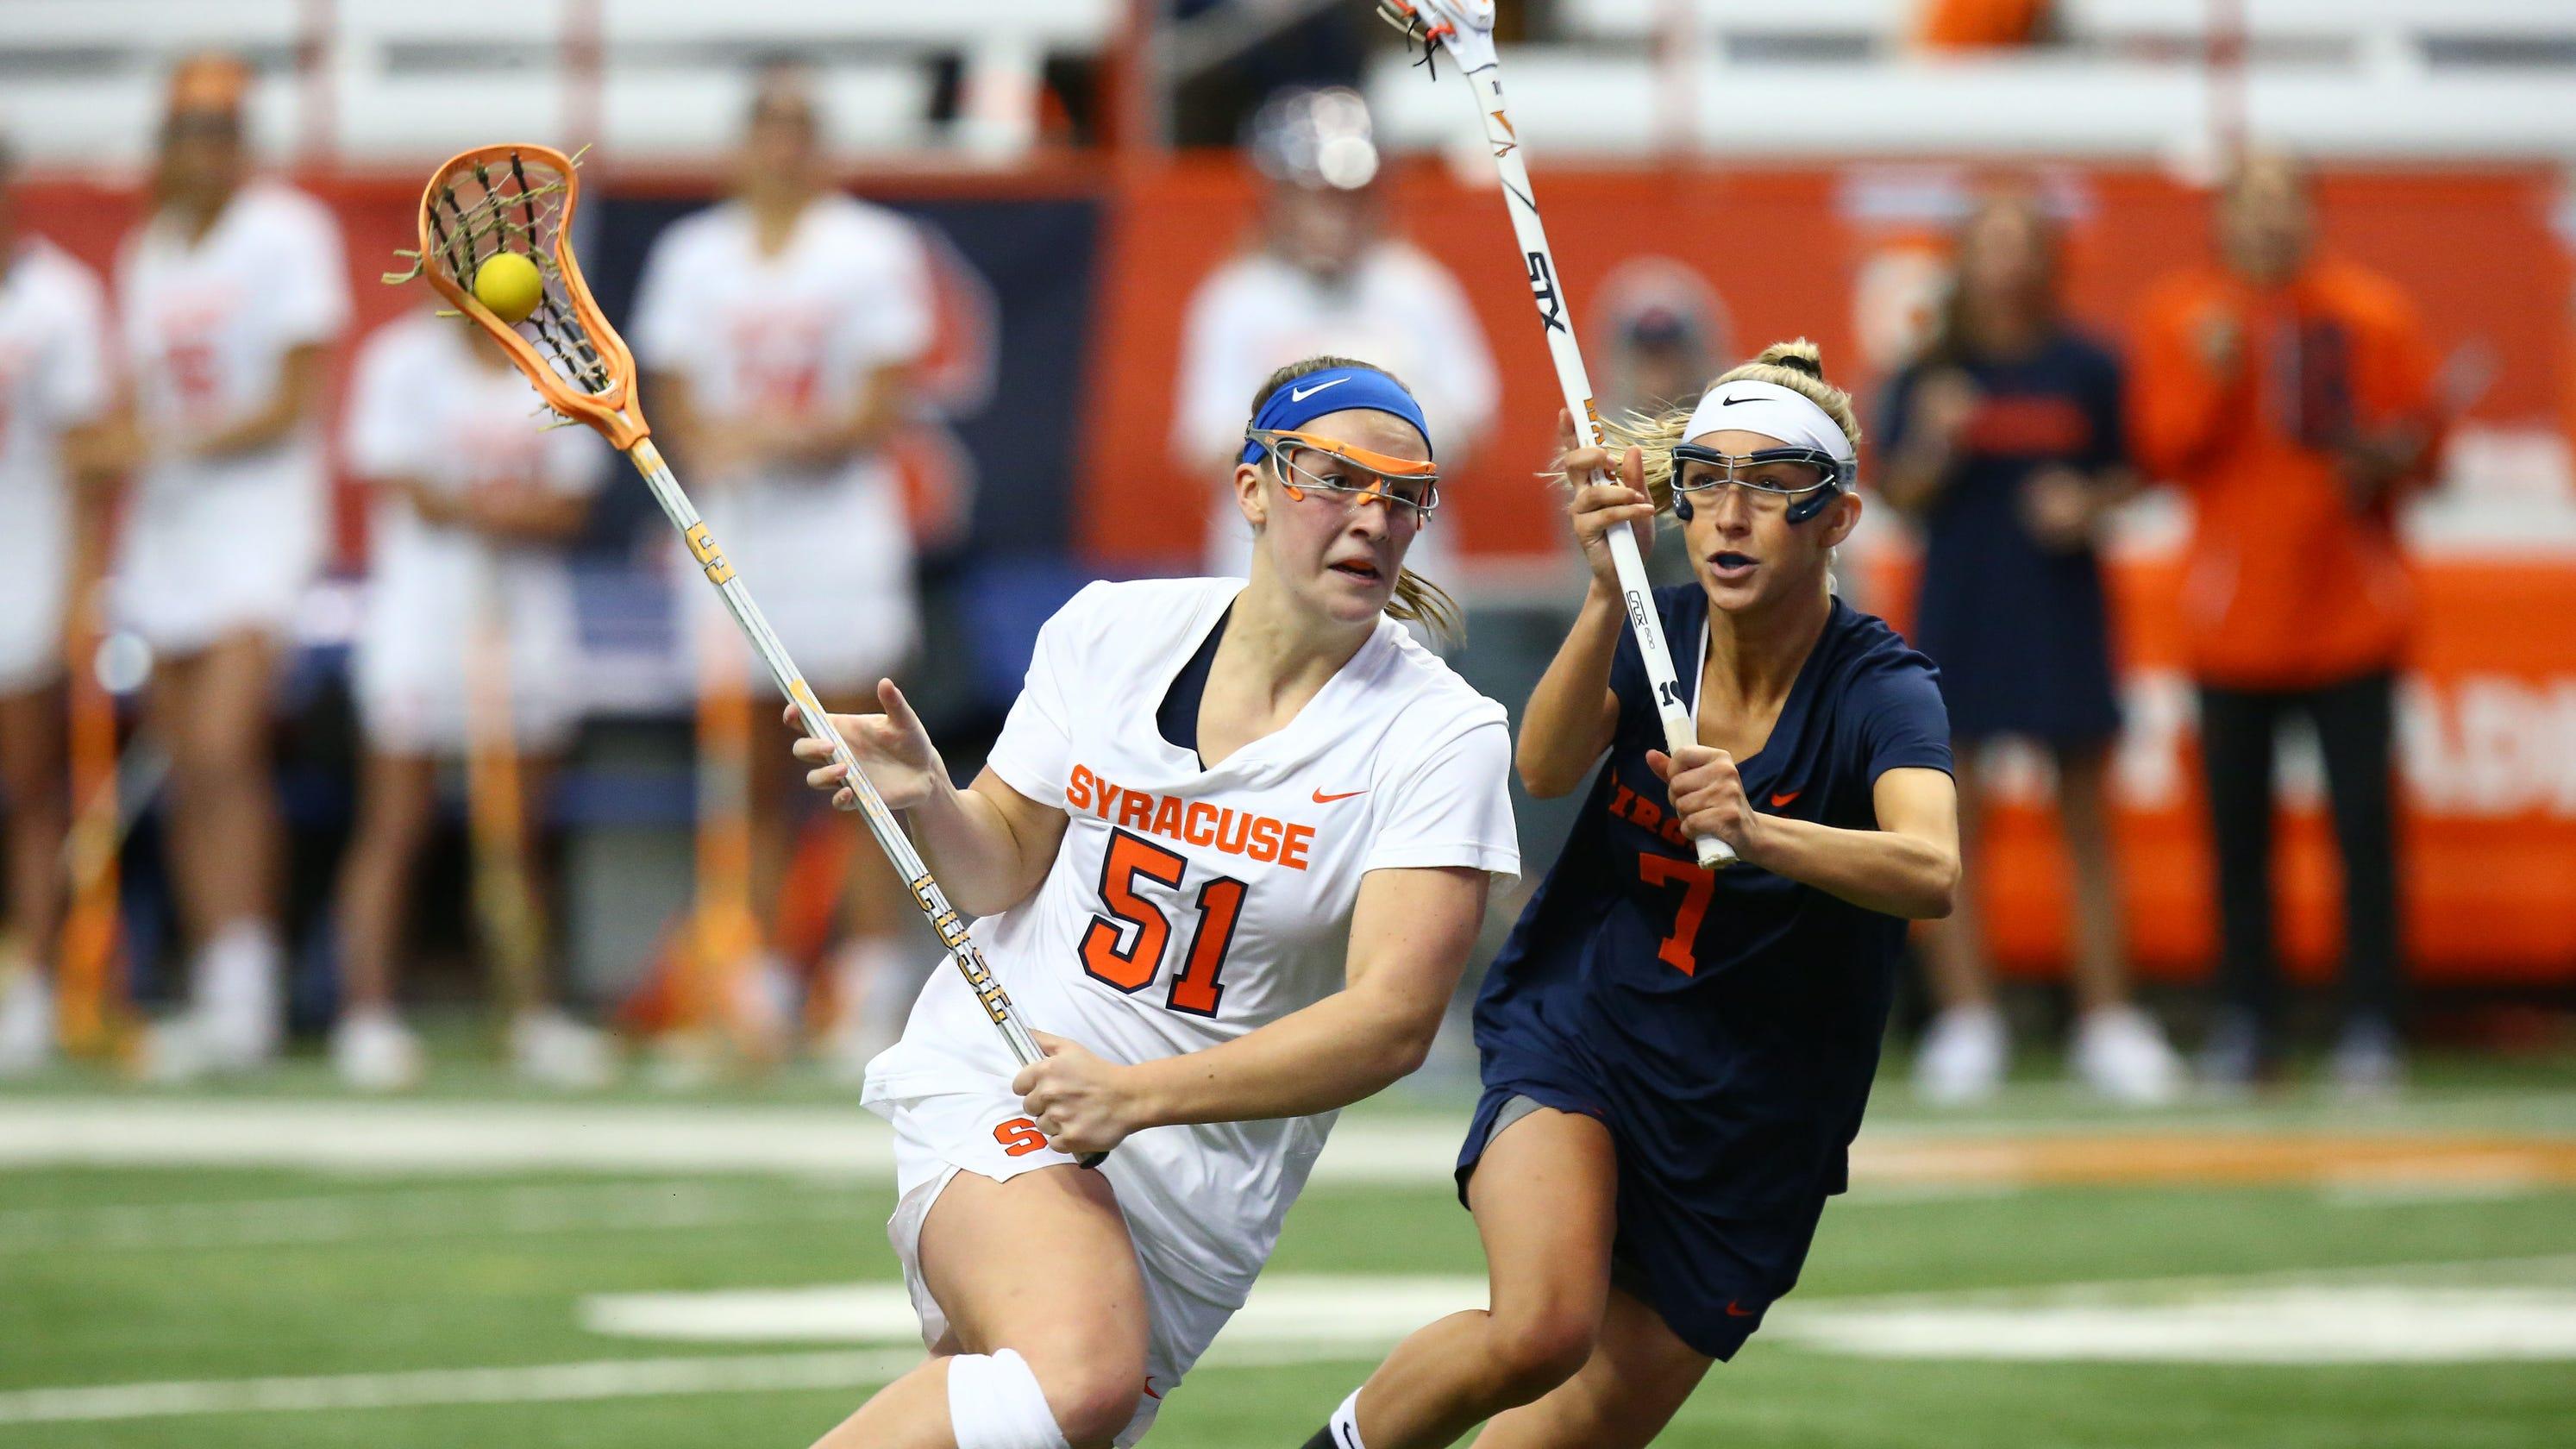 Emily Hawryschuk leads Syracuse women into NCAA lacrosse